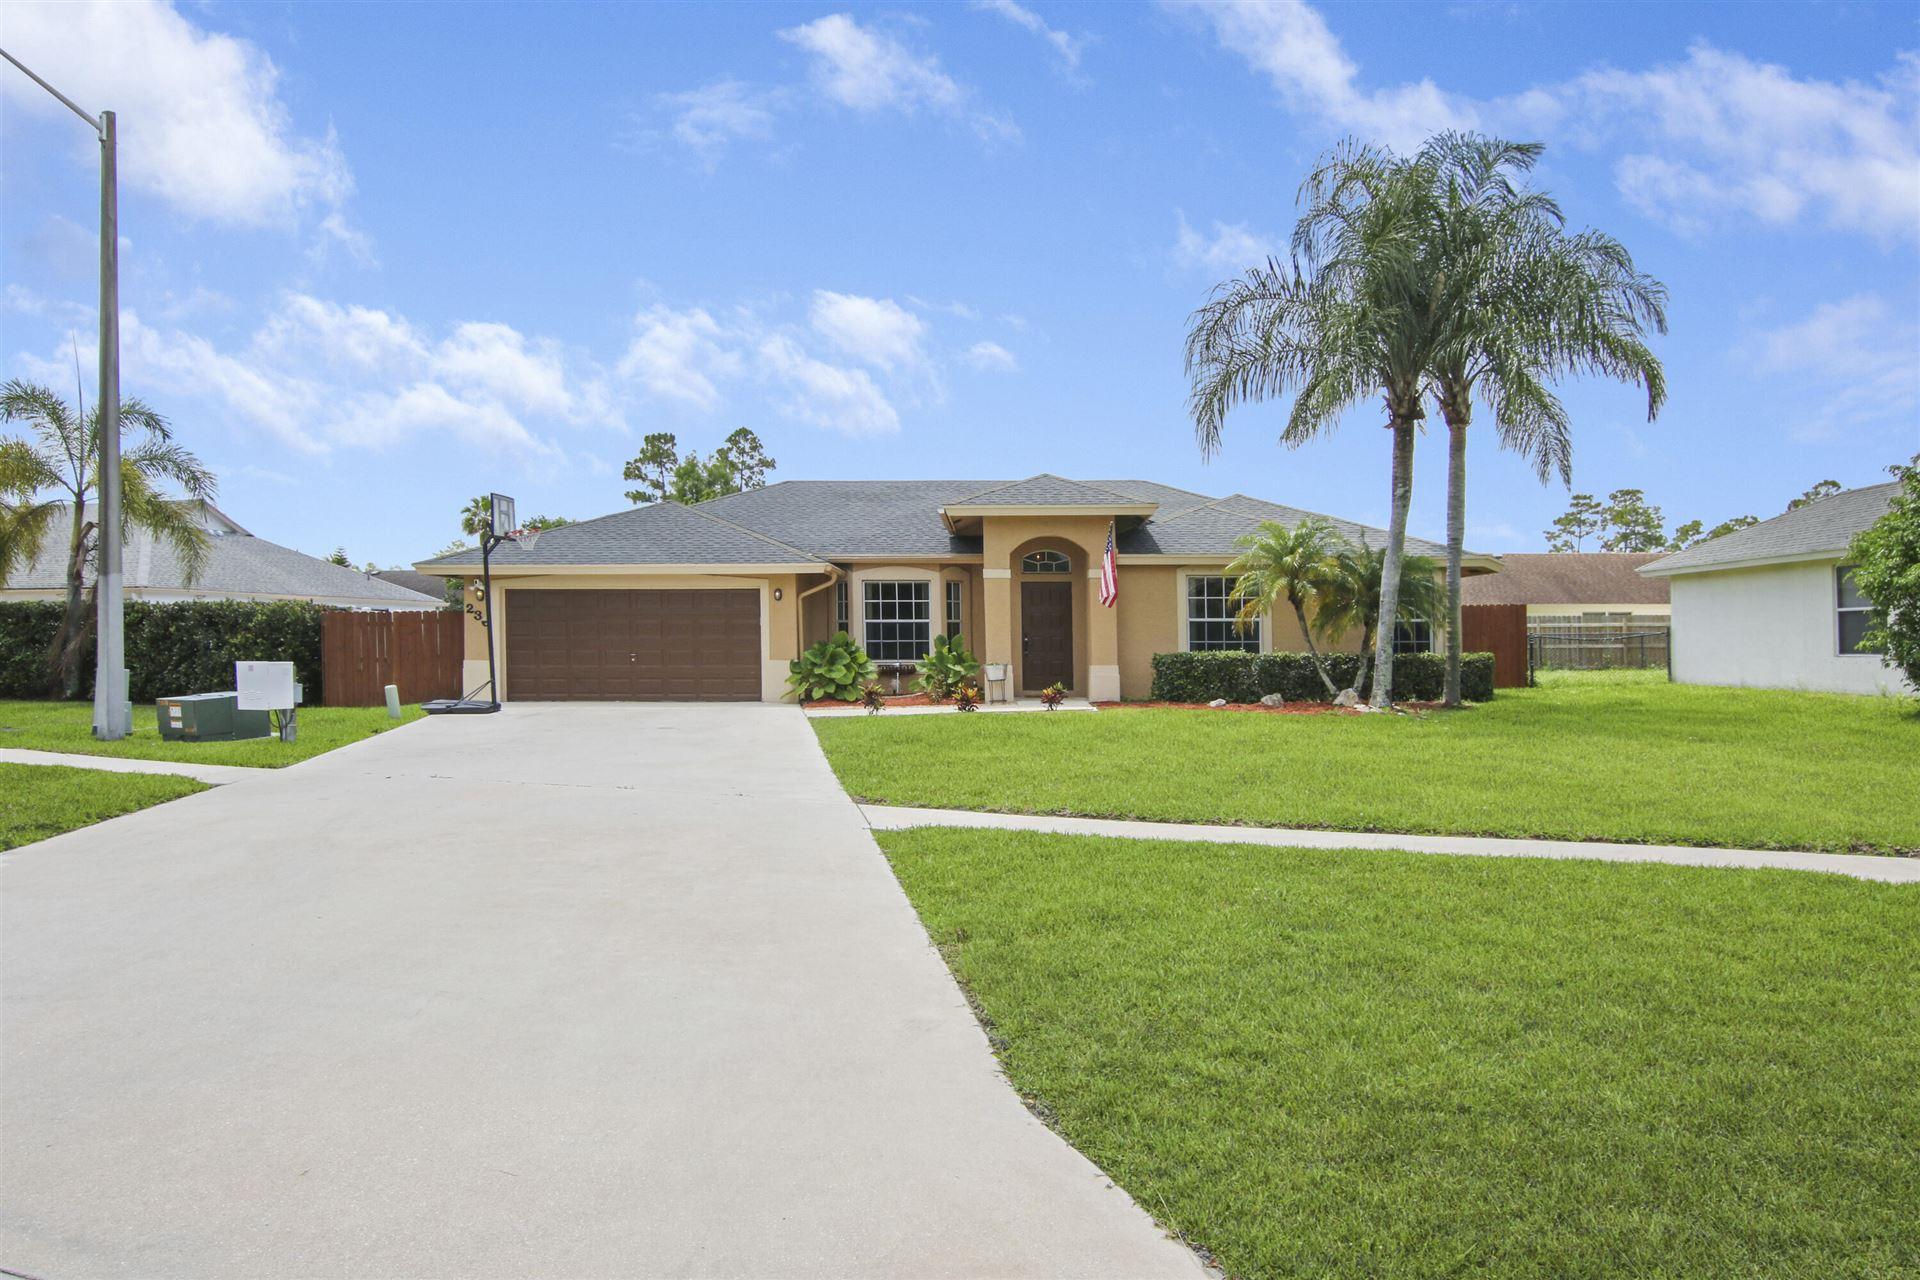 236 Park Road N, Royal Palm Beach, FL 33411 - MLS#: RX-10712597